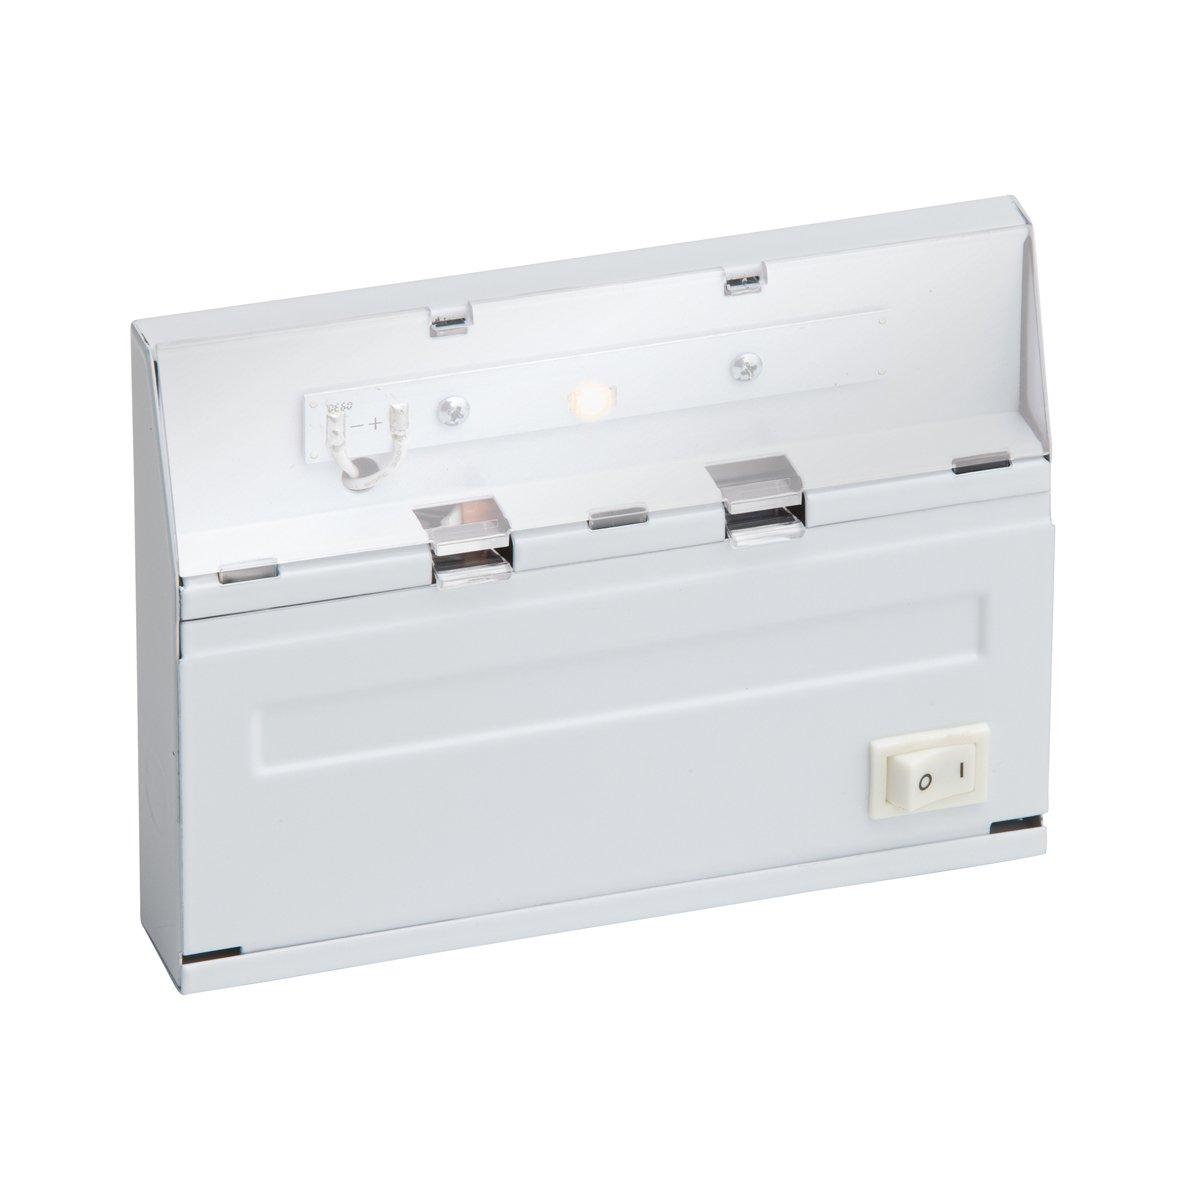 Kichler 12051WH DirectWire LED Under Cabinet Light, White - Under ...